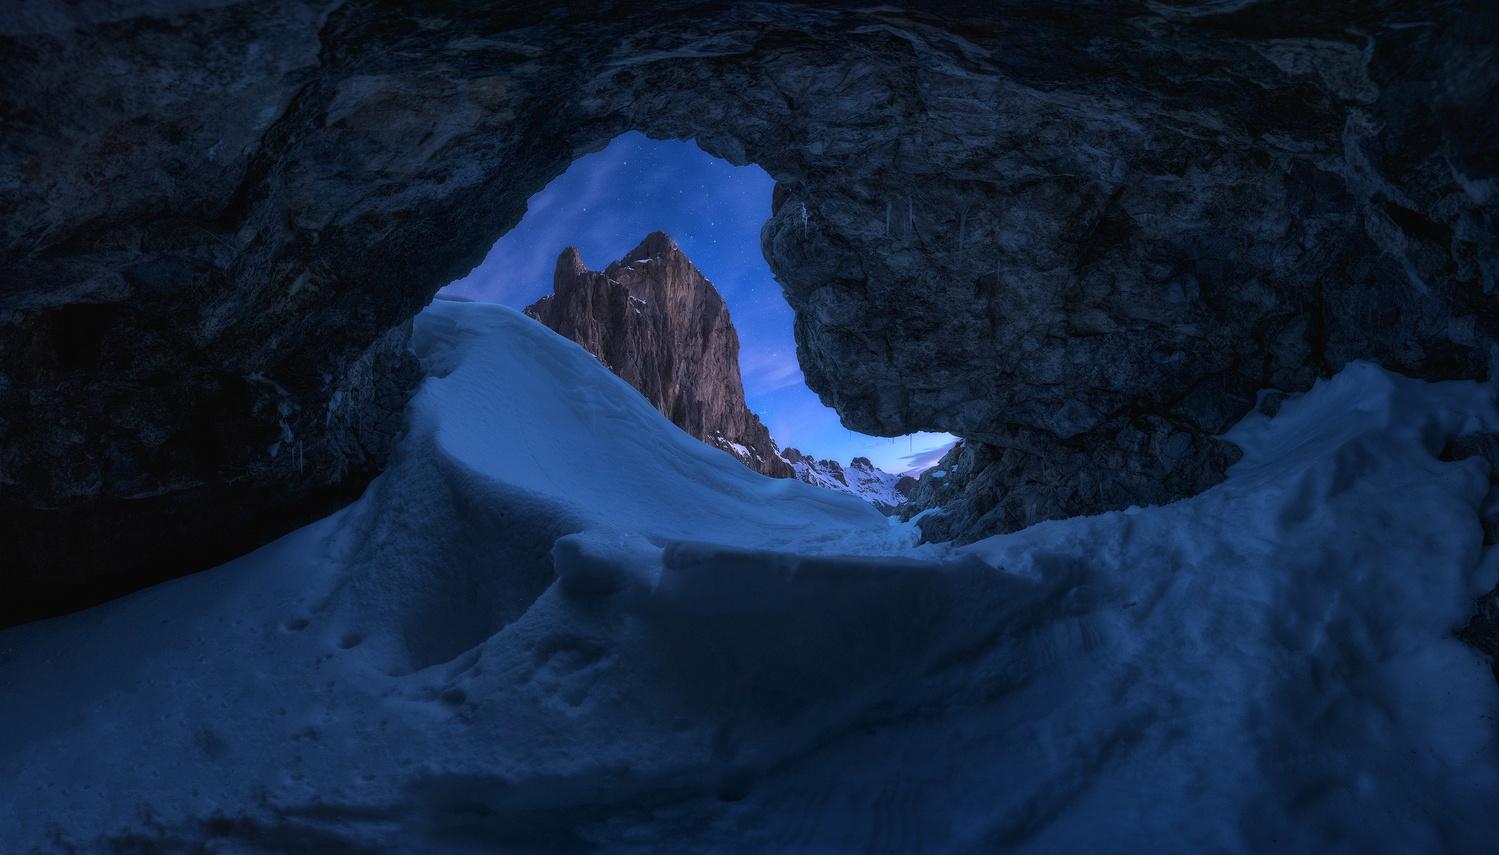 Cave by carlos gonzalez